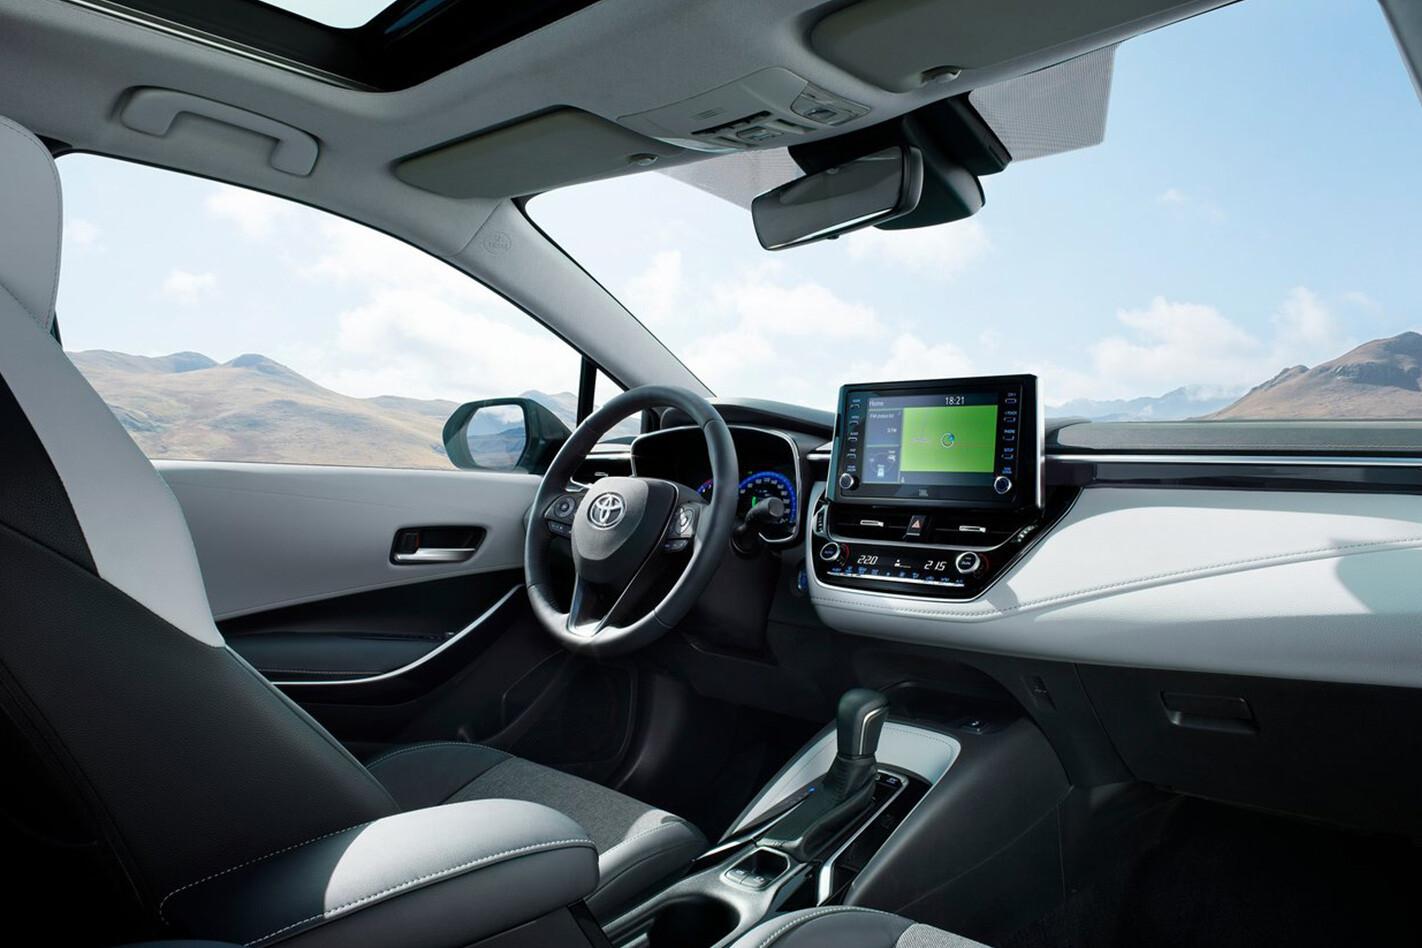 Toyota Corolla Wagon Interior Jpg